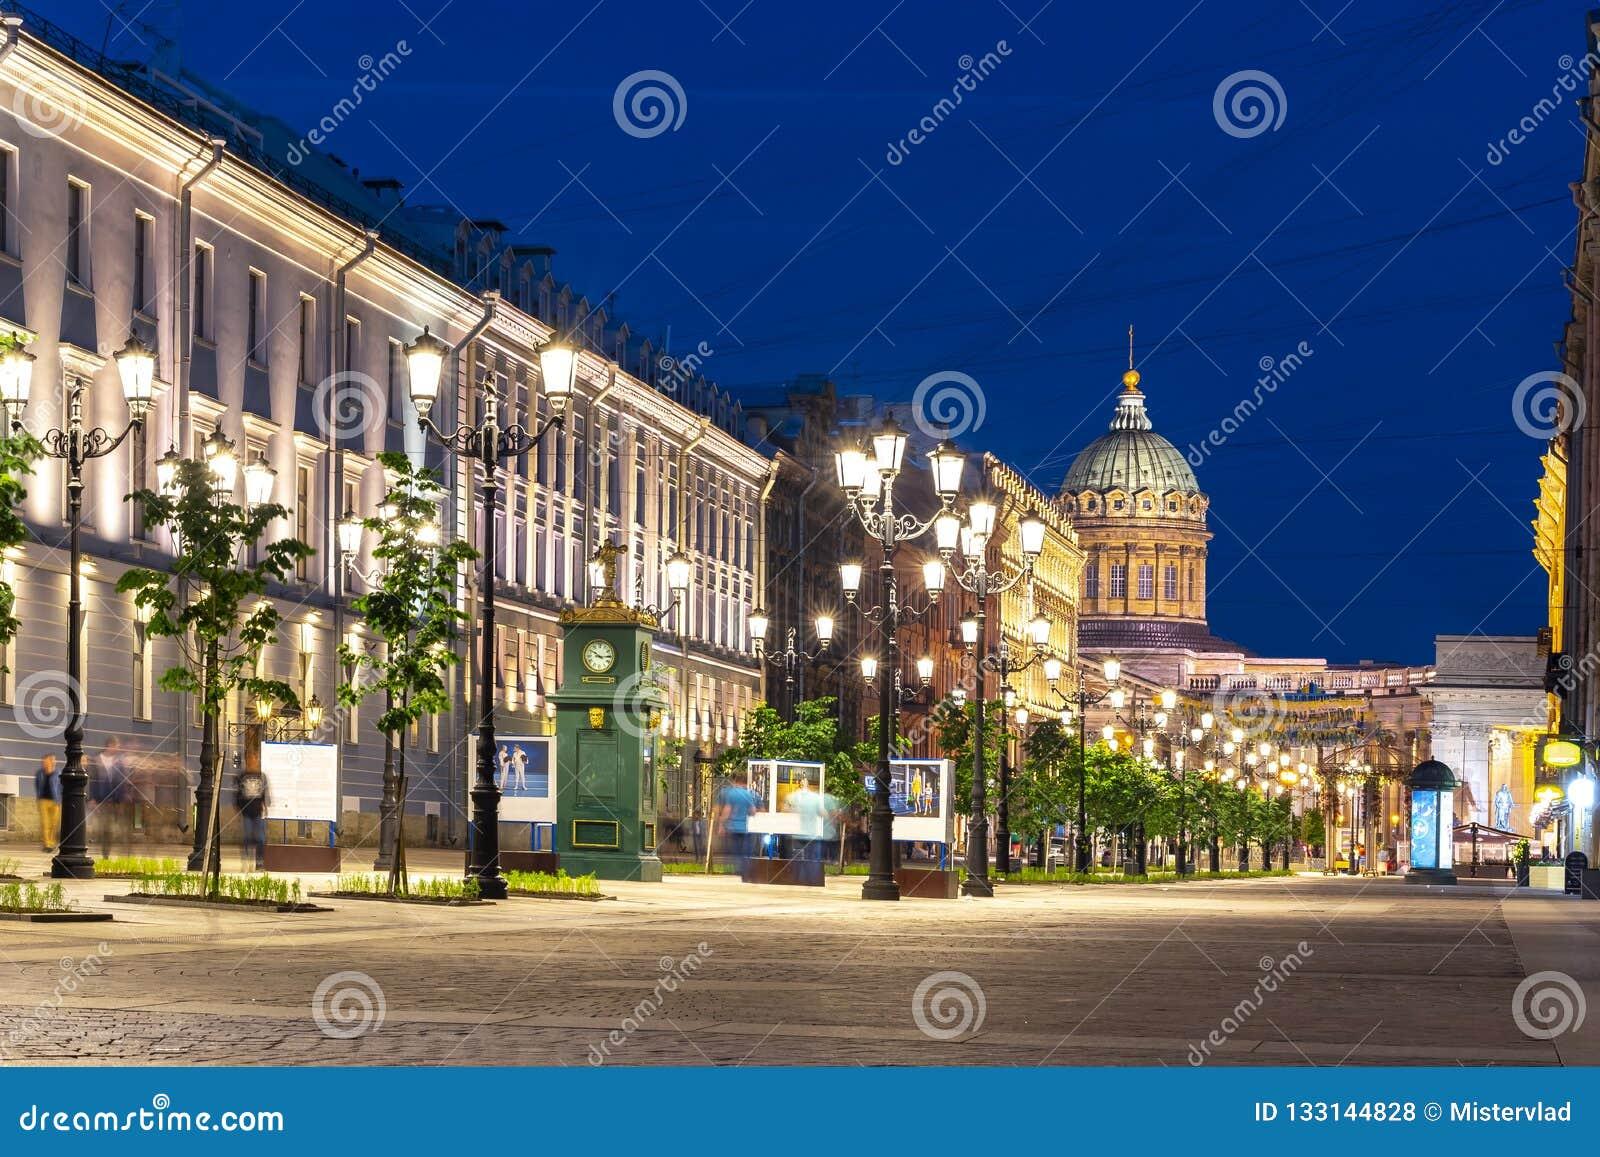 Calle de Malaya Konyushennaya y catedral en la noche, St Petersburg, Rusia de Kazán